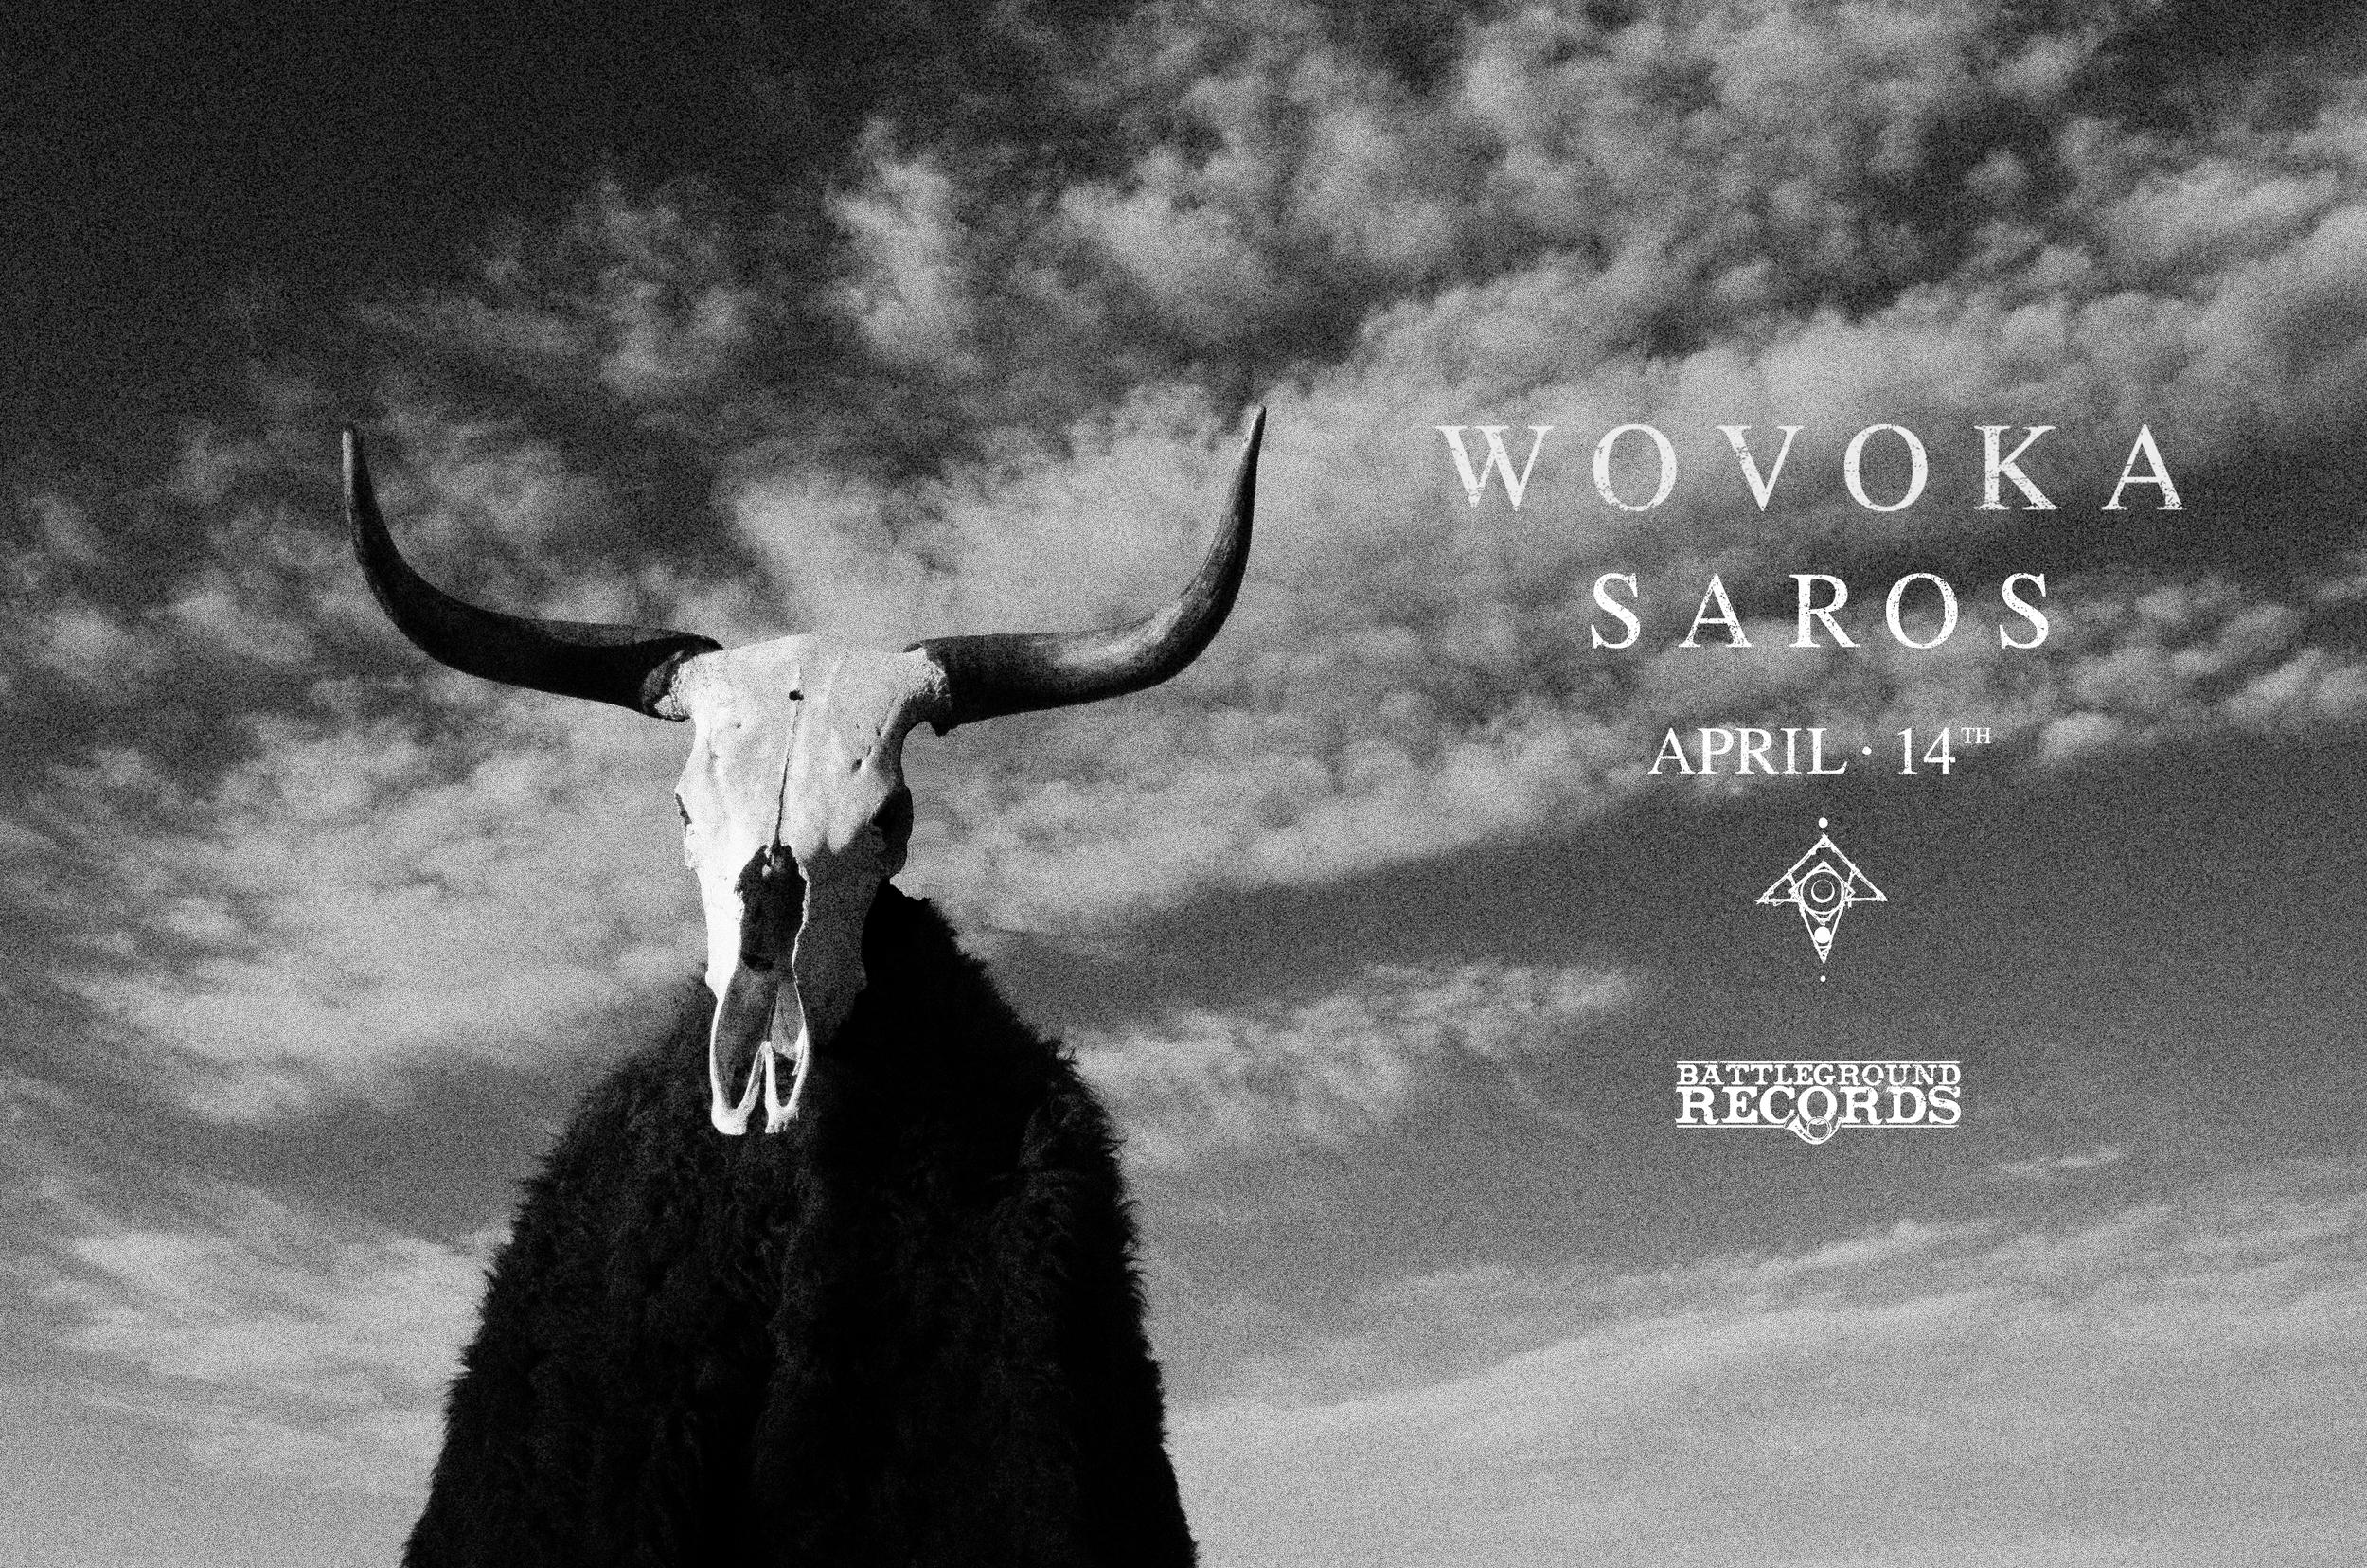 Saros_Wovoka_facebook_banner-BG_logo.jpg